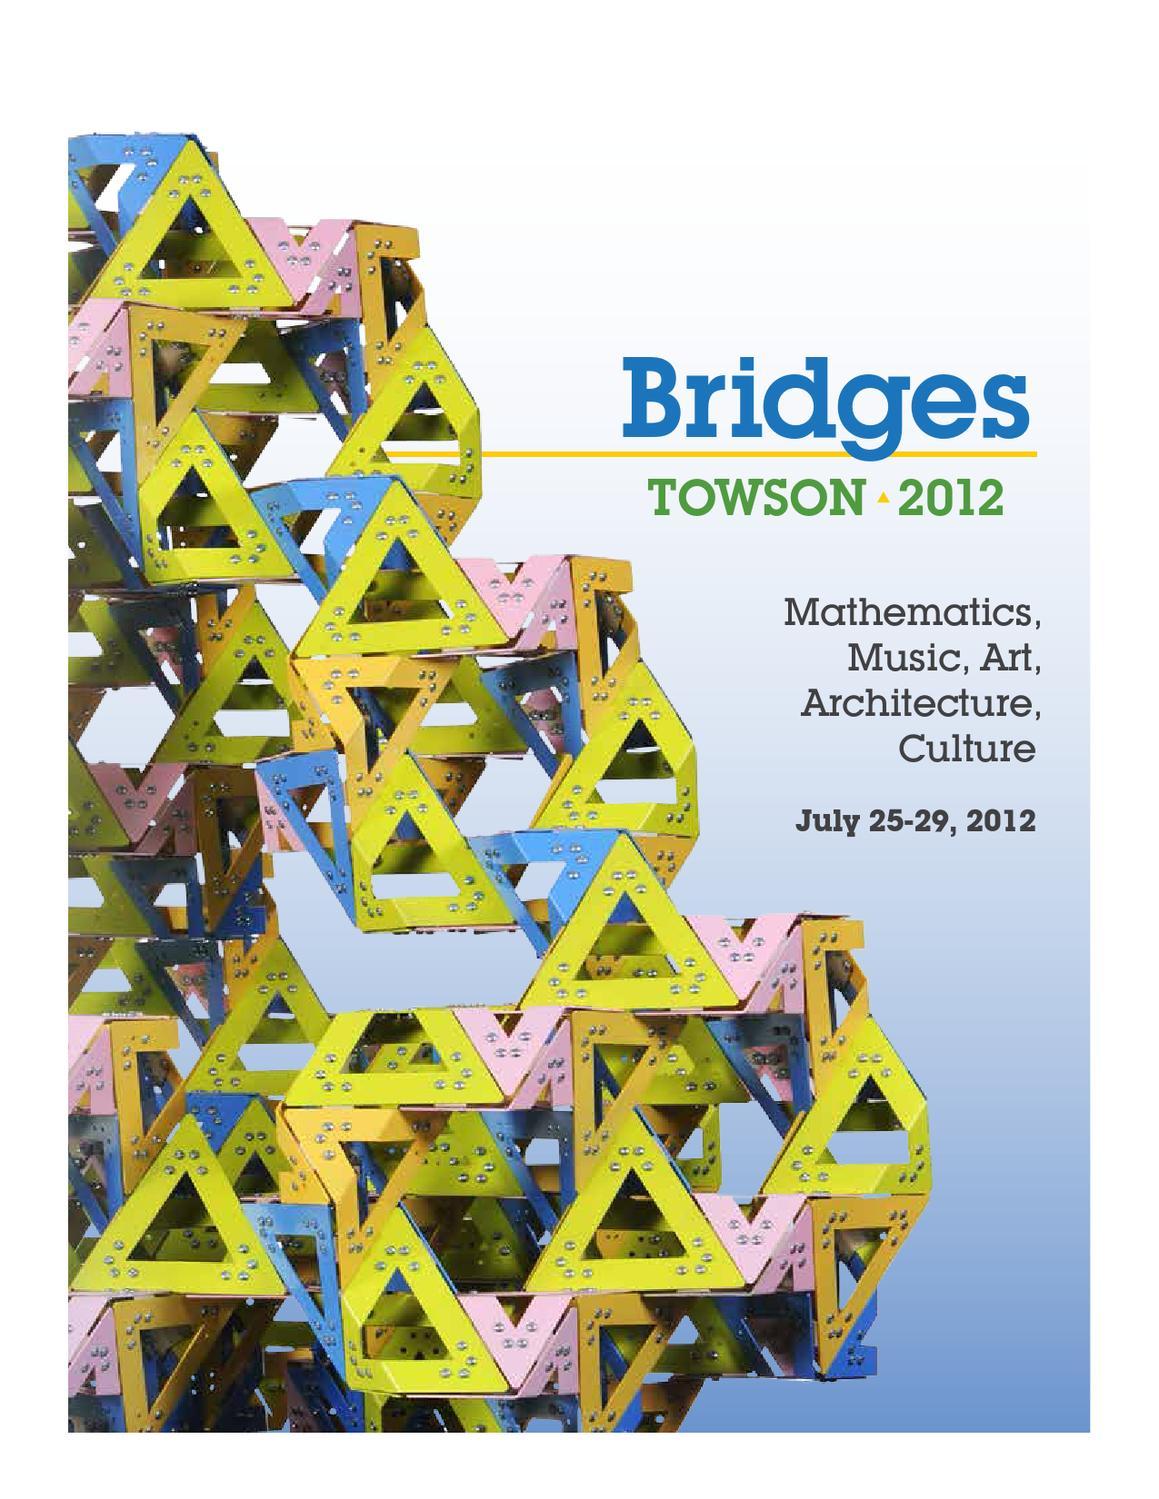 Bridges Towson 2012 FAMILY DAY & MATH-ART EXPO by Kristóf